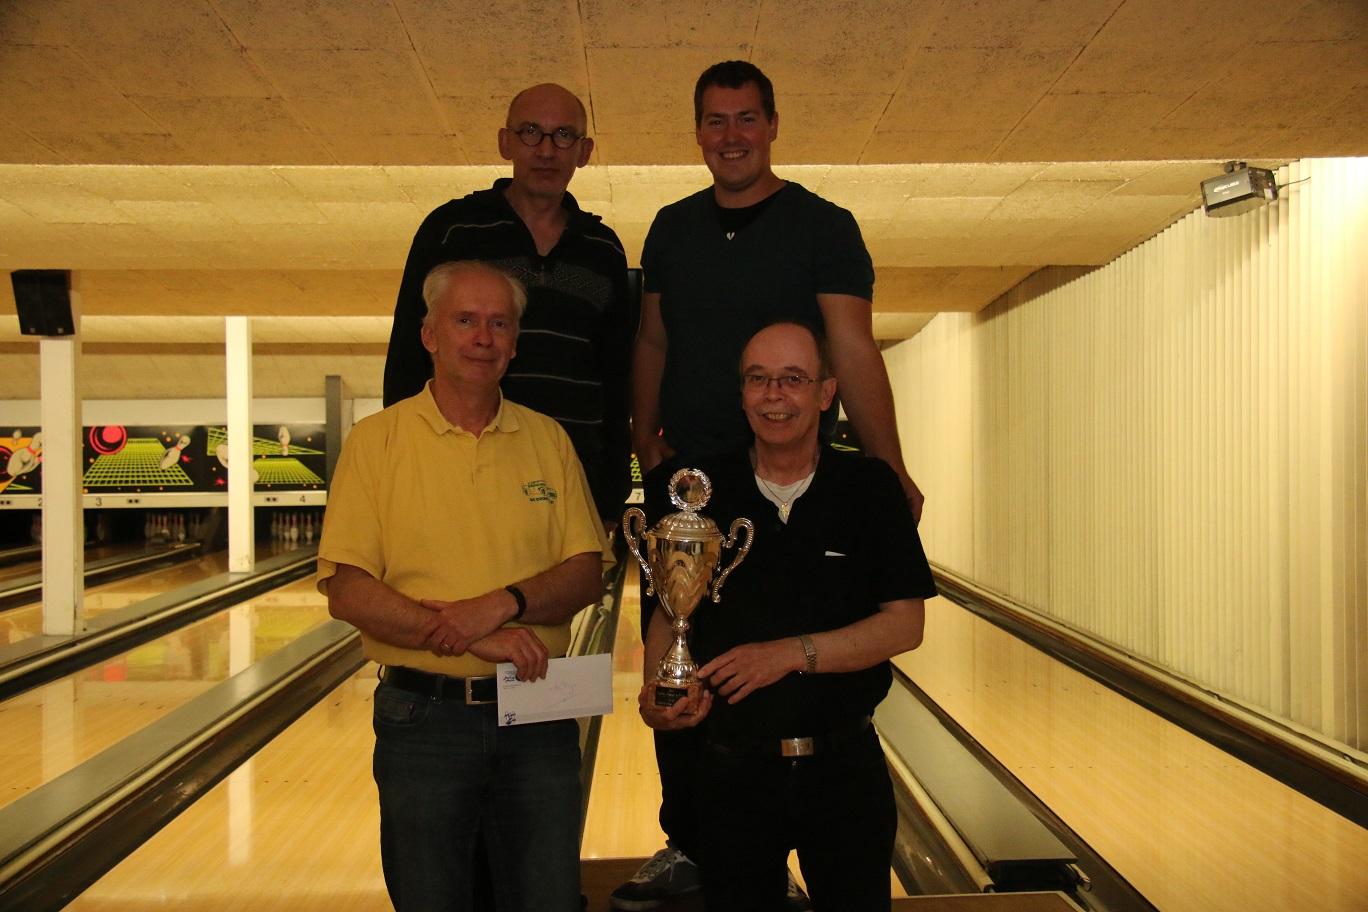 http://www.bowlingverenigingheiloo.nl/fotos_verhalen/foto's/2014_0522-SupFin-Bekerwinnaars.jpg